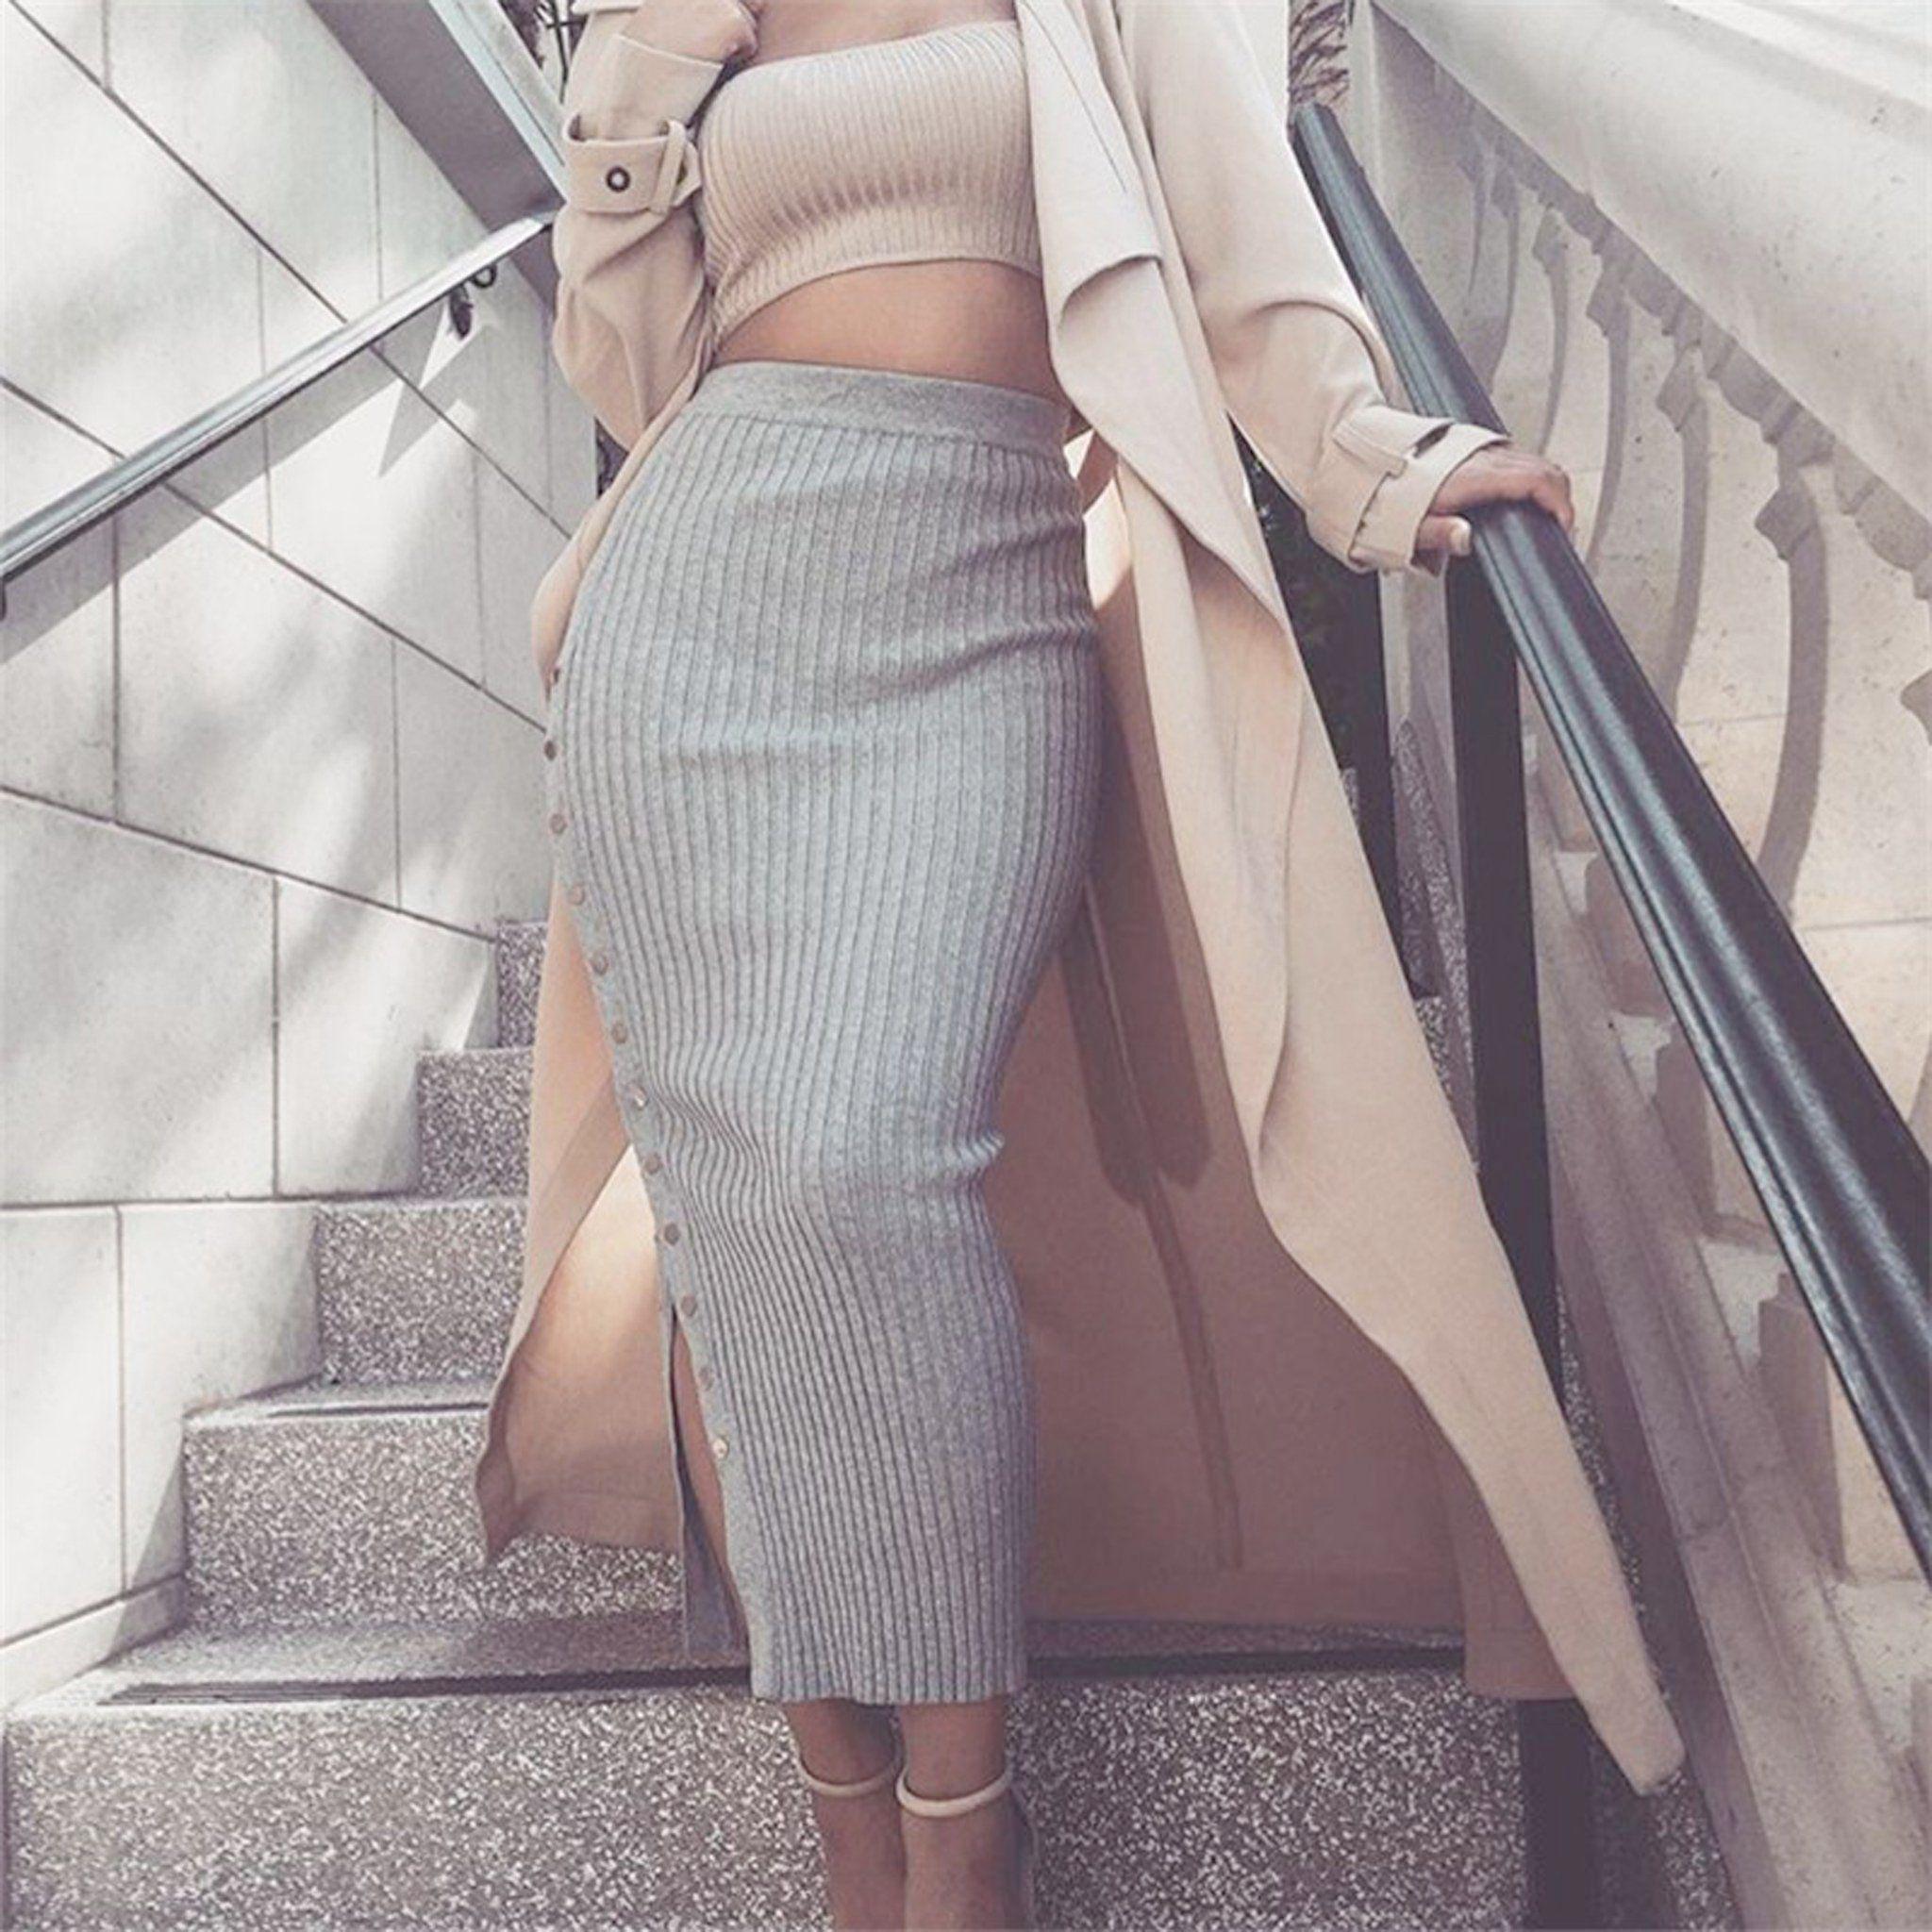 Topashe Womens Sleeveless Split Tight Tight Skirt Outfit